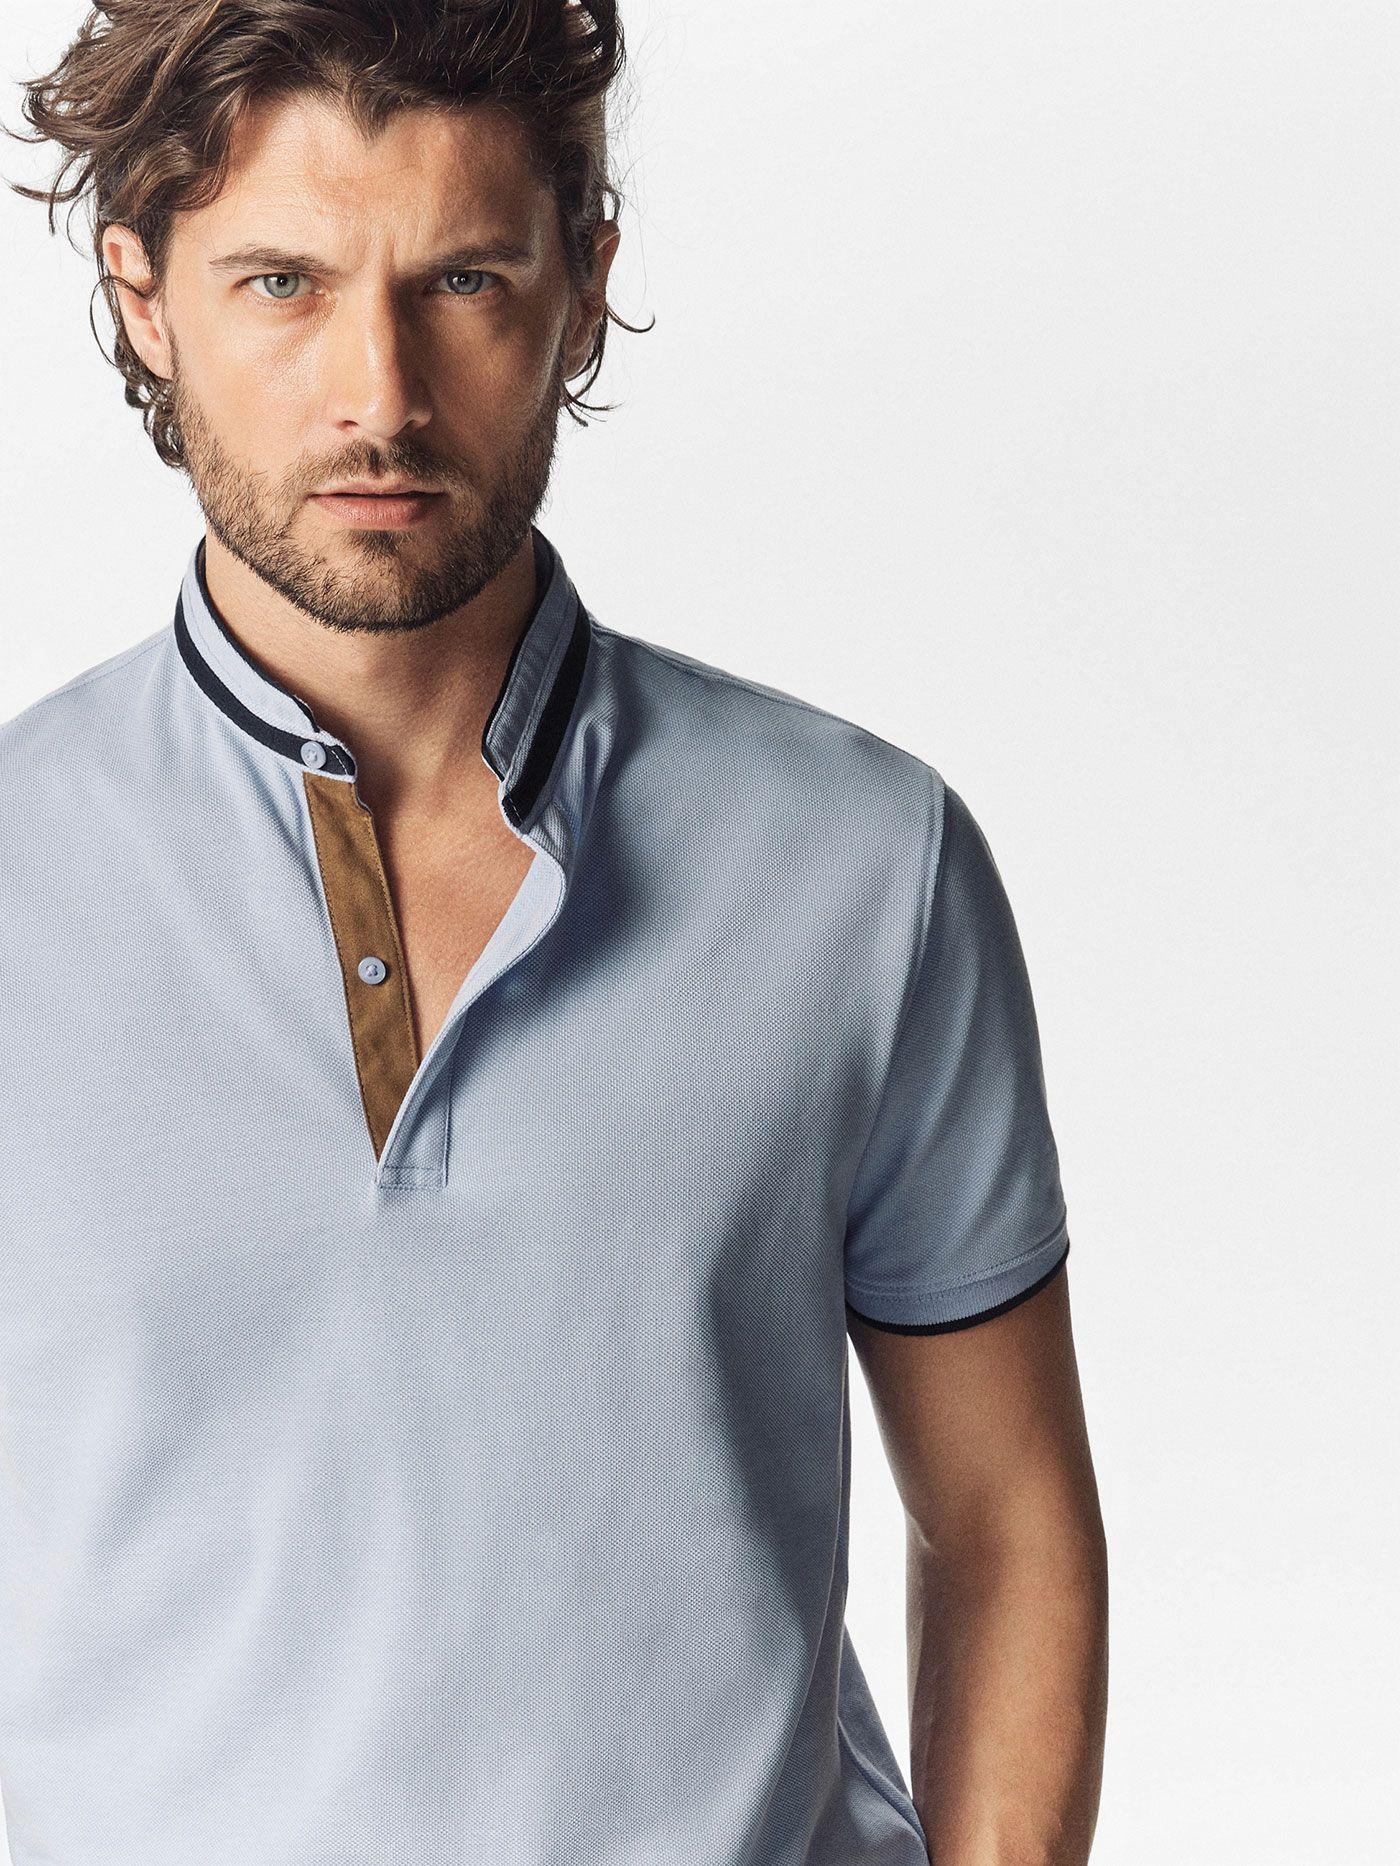 Massimo Dutti Mens Navy Blue Polo Shirt Size L Shirts